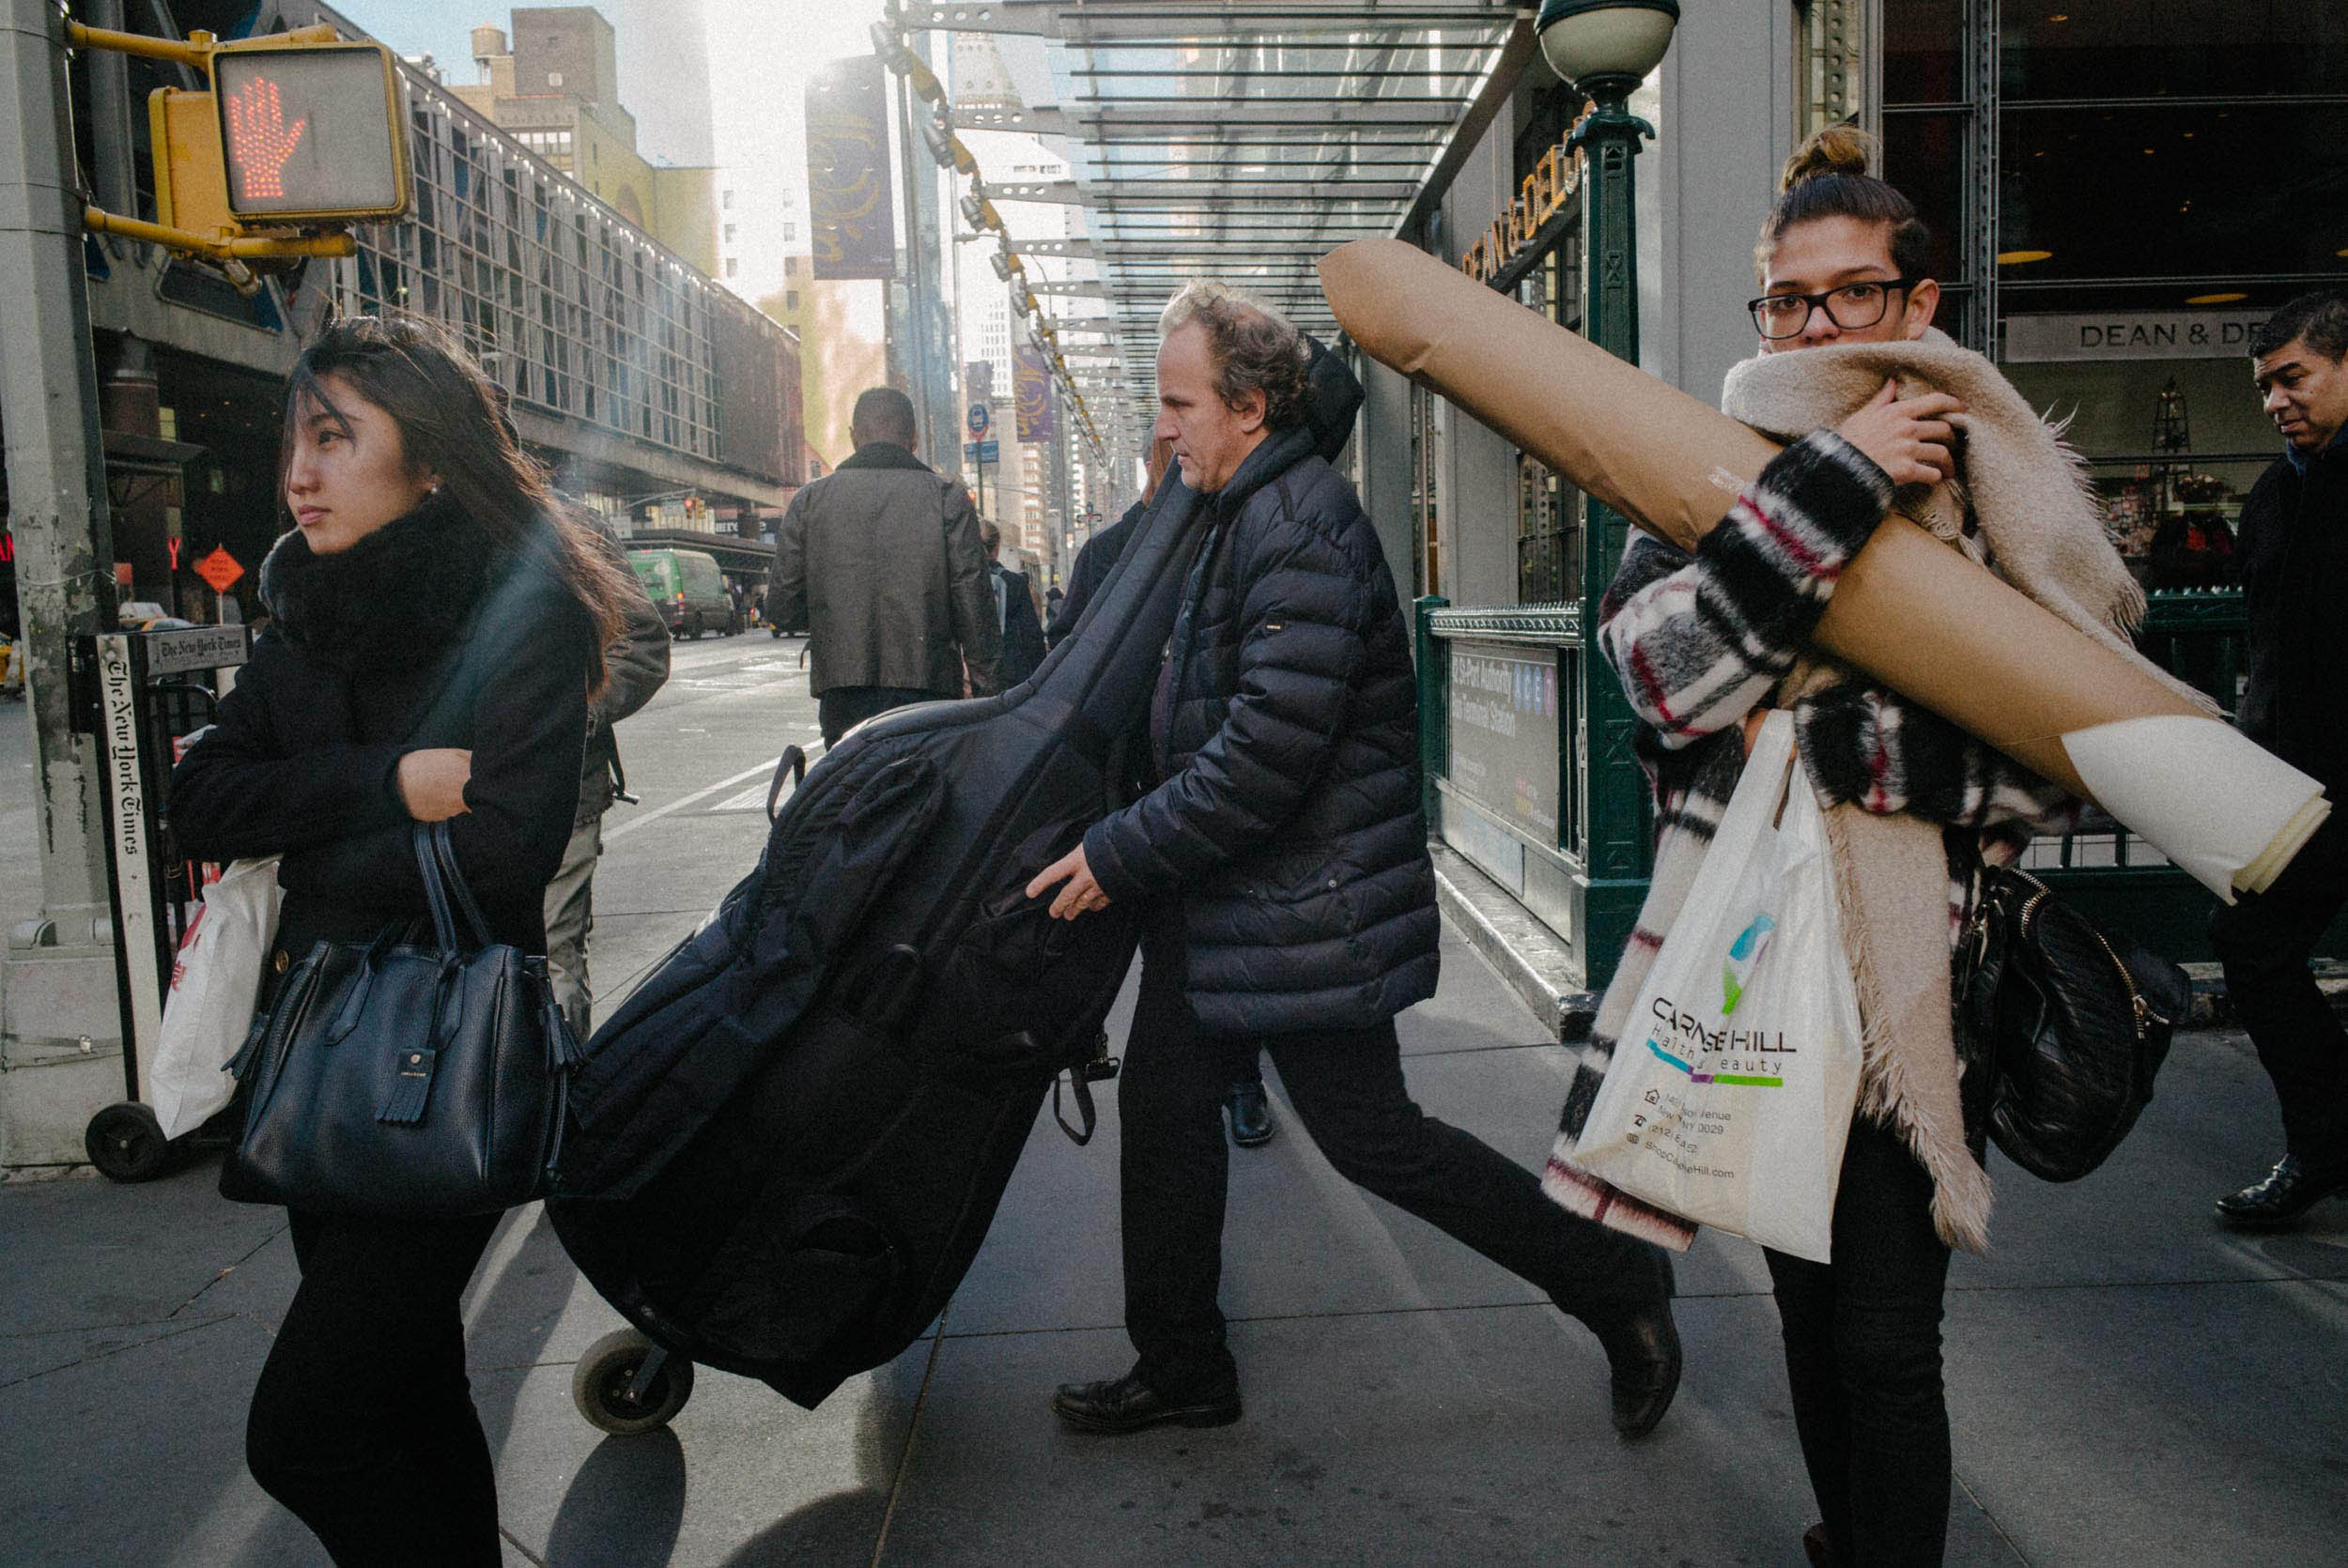 new-york-city-street-photography-Sebastian-Siadecki-9